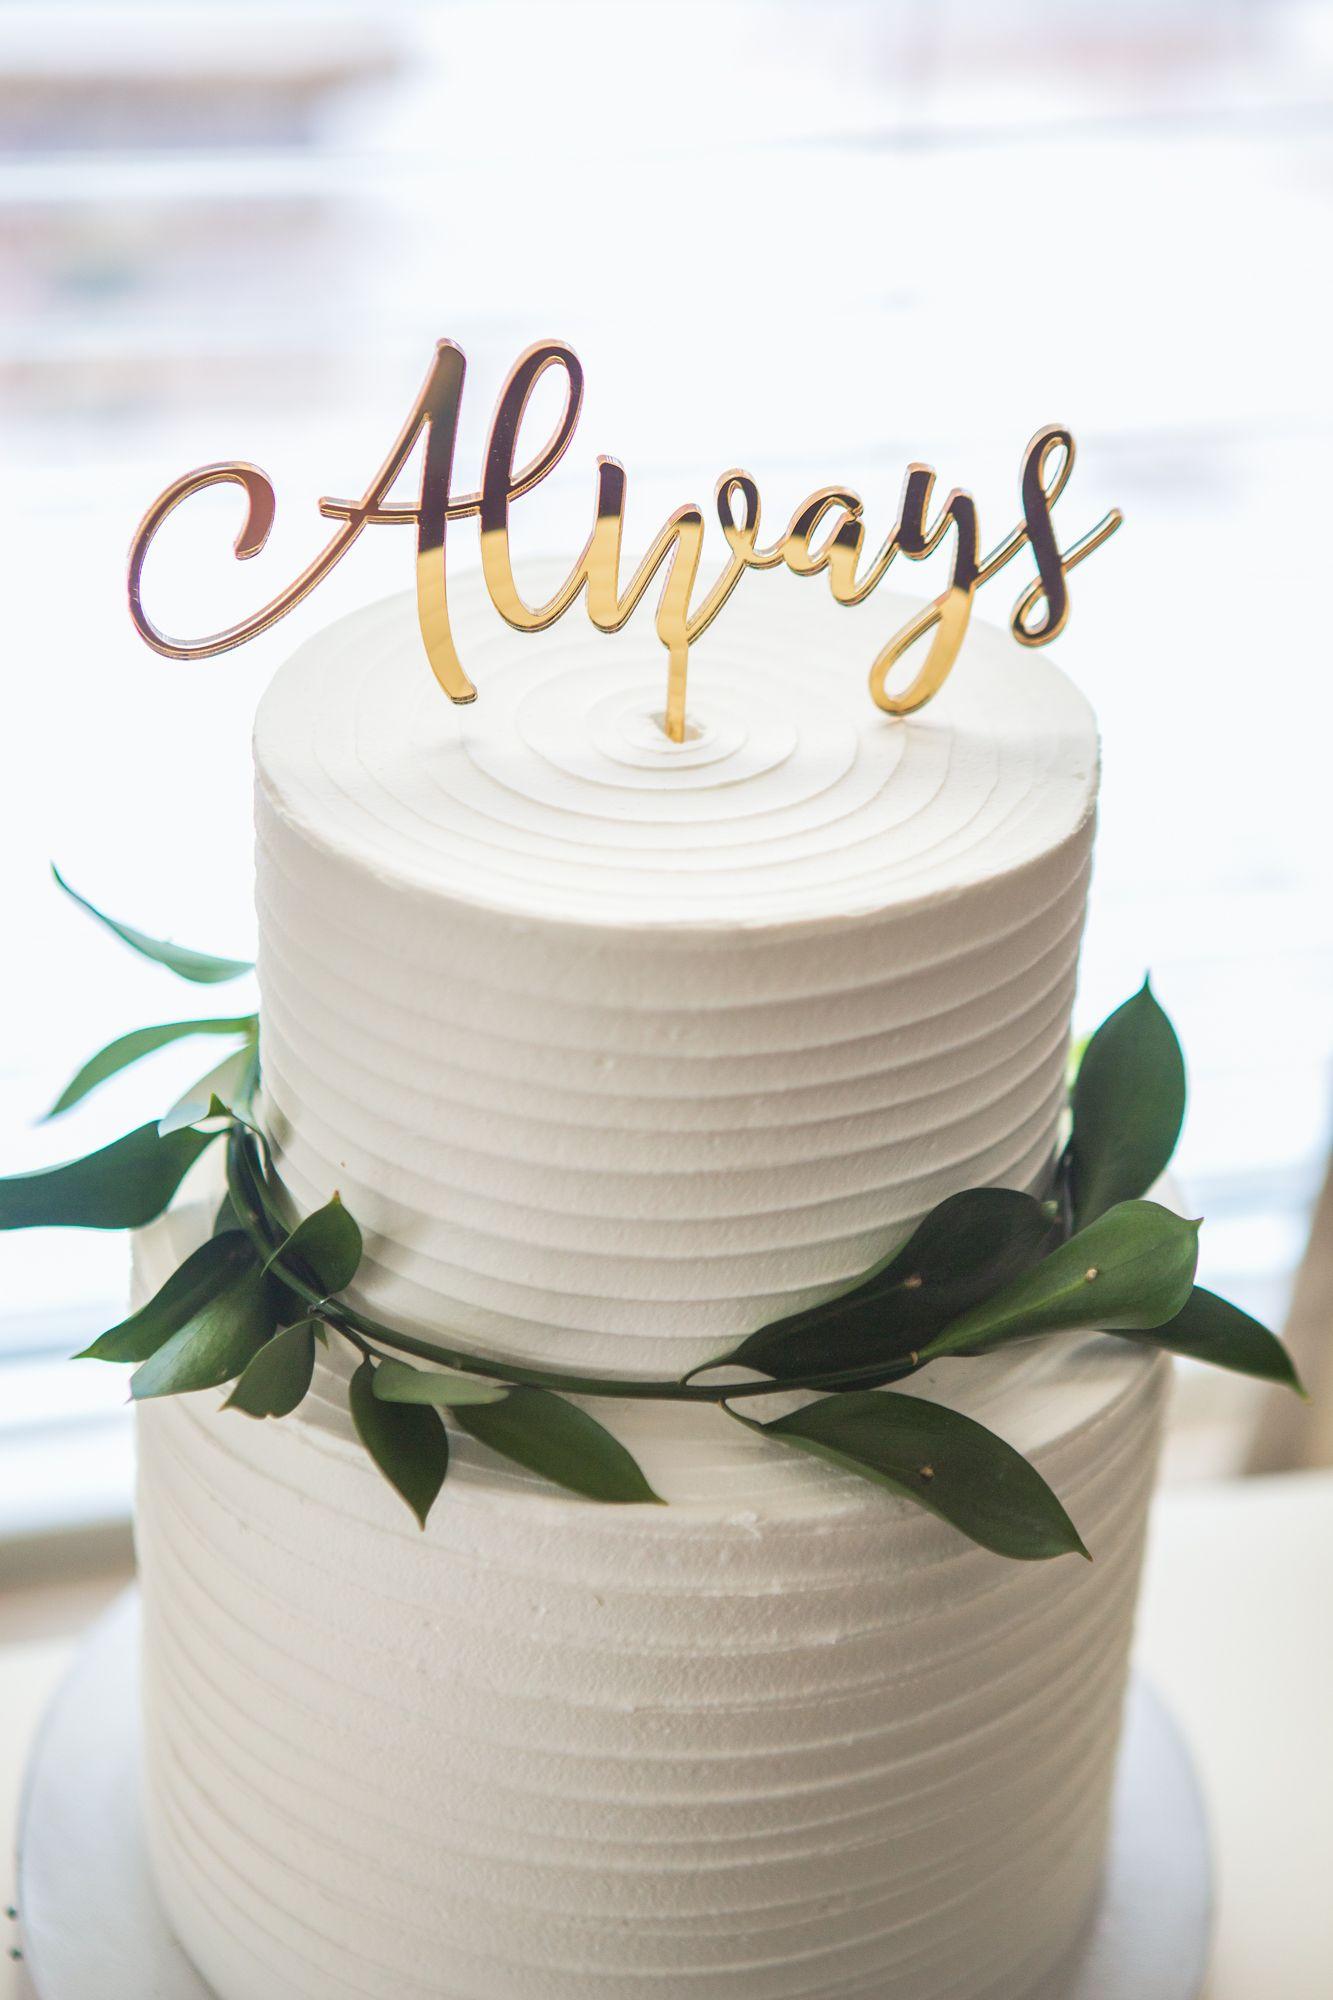 Wedding Cake Topper Always Gold Calligraphy Script Decor In Custom Colors Or Theme Reception Dessert Item